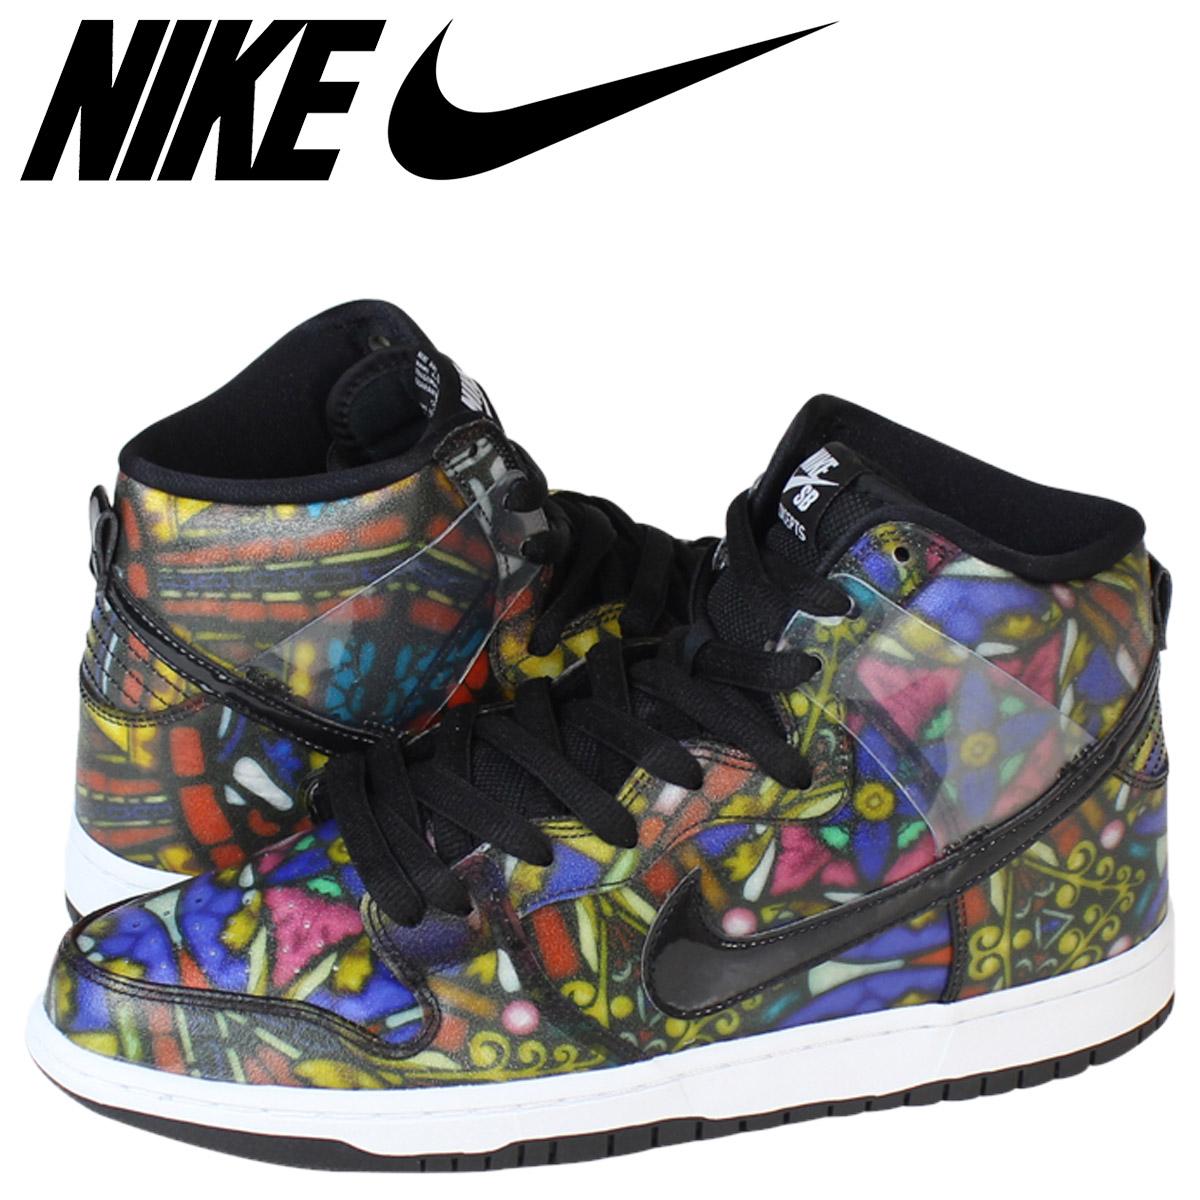 Nike Dunk High Premium SB 313171 606